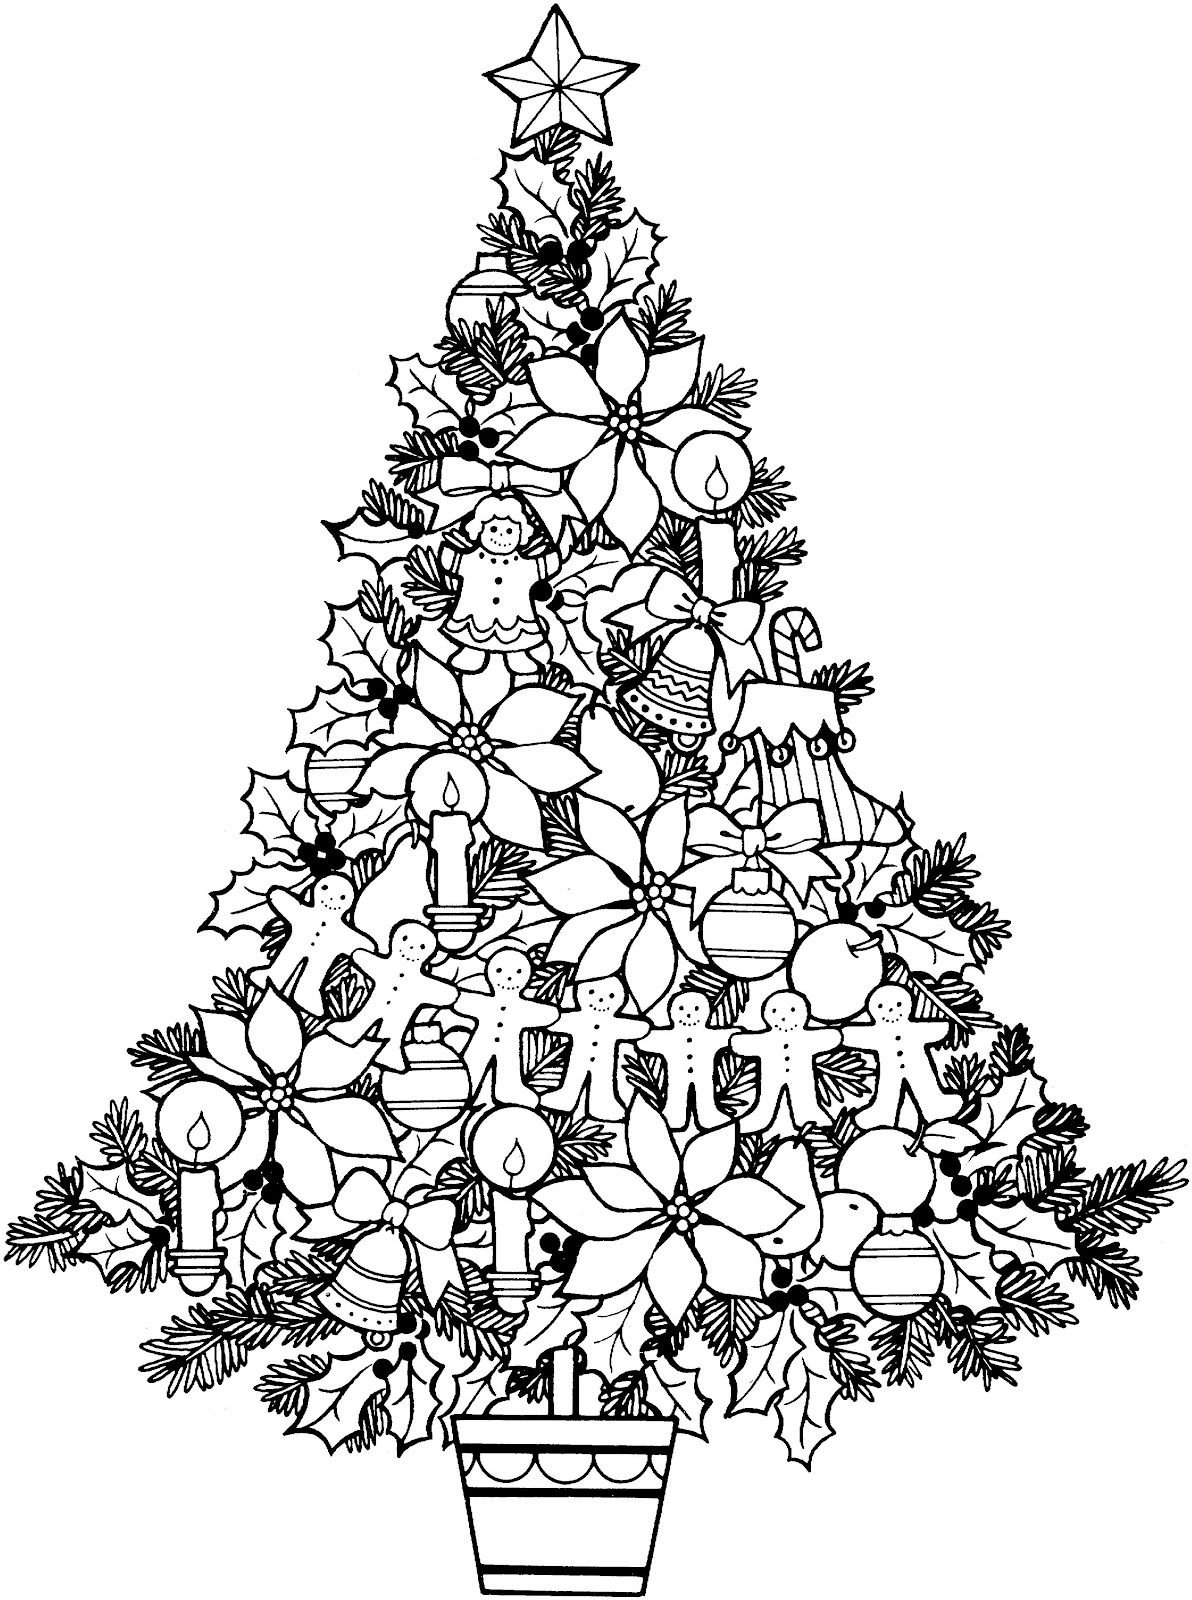 Christmas Tree Black And White Christmas Black And White Clipart Christmas Tree Coloring Page Tree Coloring Page Christmas Coloring Pages